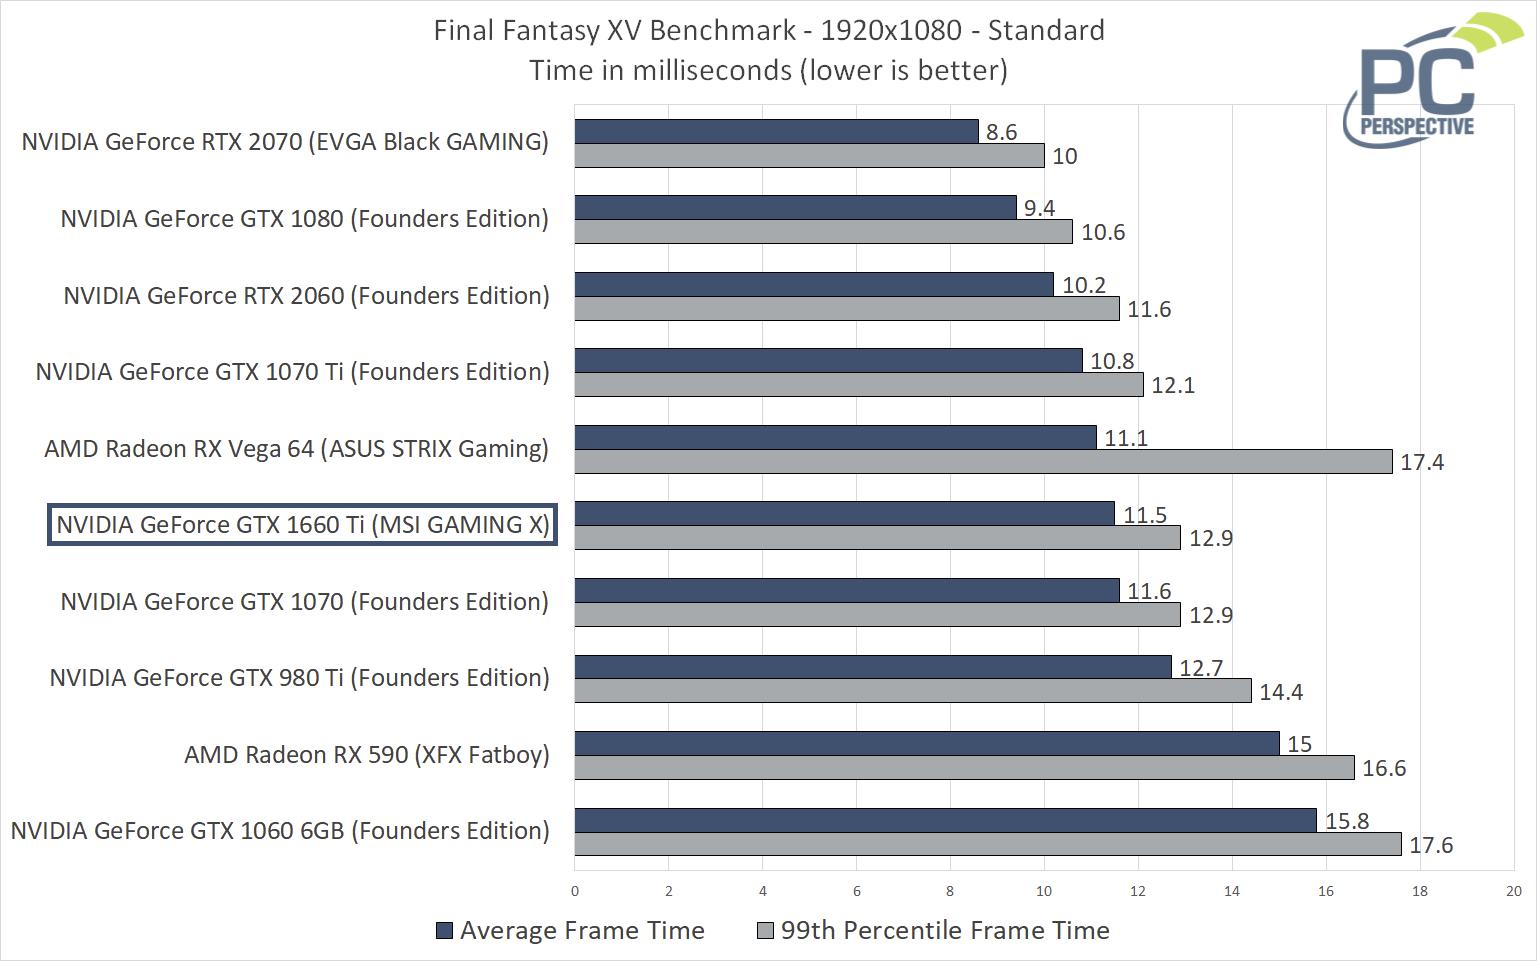 ffxv-1080-ft.png